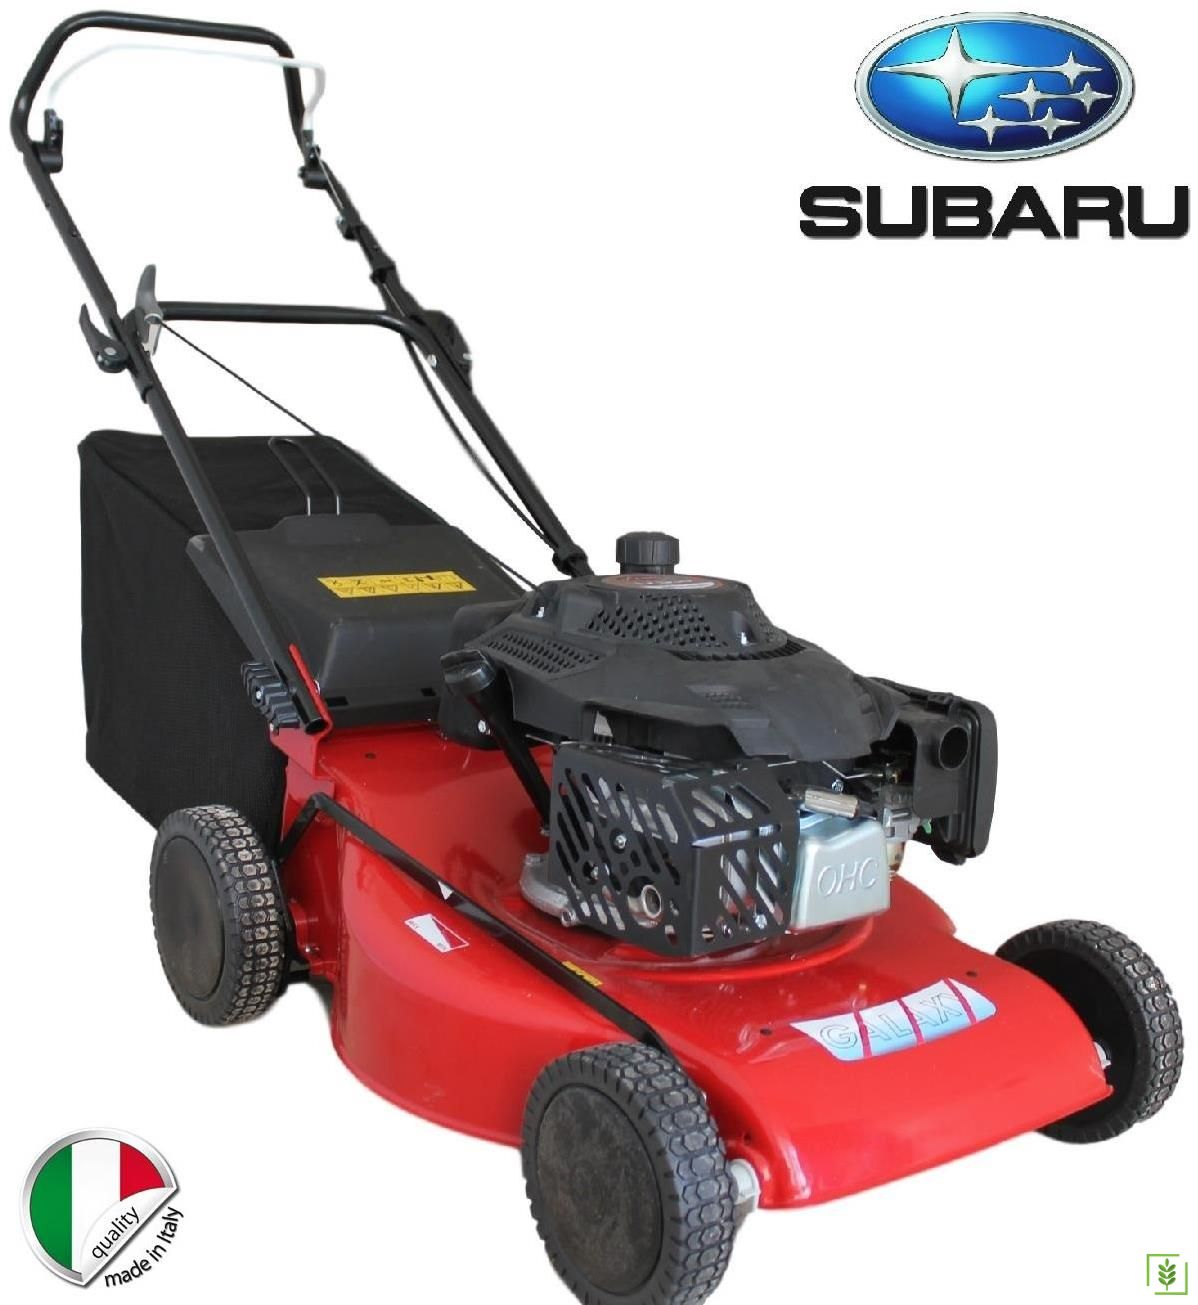 Subaru Motorlu Galaxy GX-53 İtmeli Çim Biçme Makinası